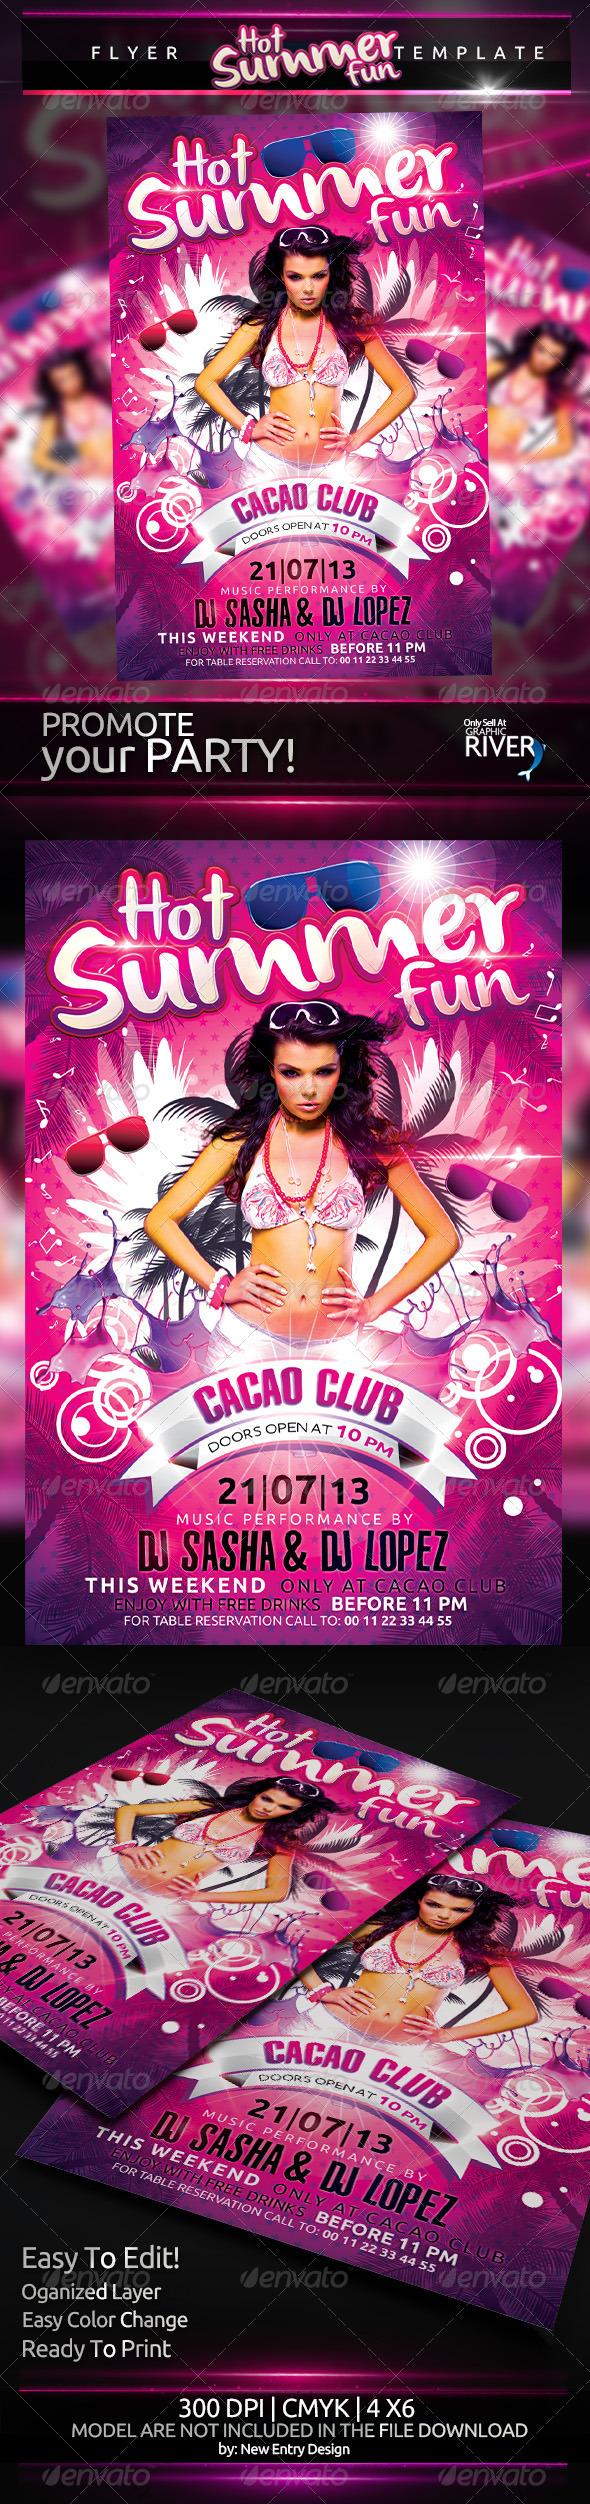 Hot Summer Fun Flyer Template - Clubs & Parties Events